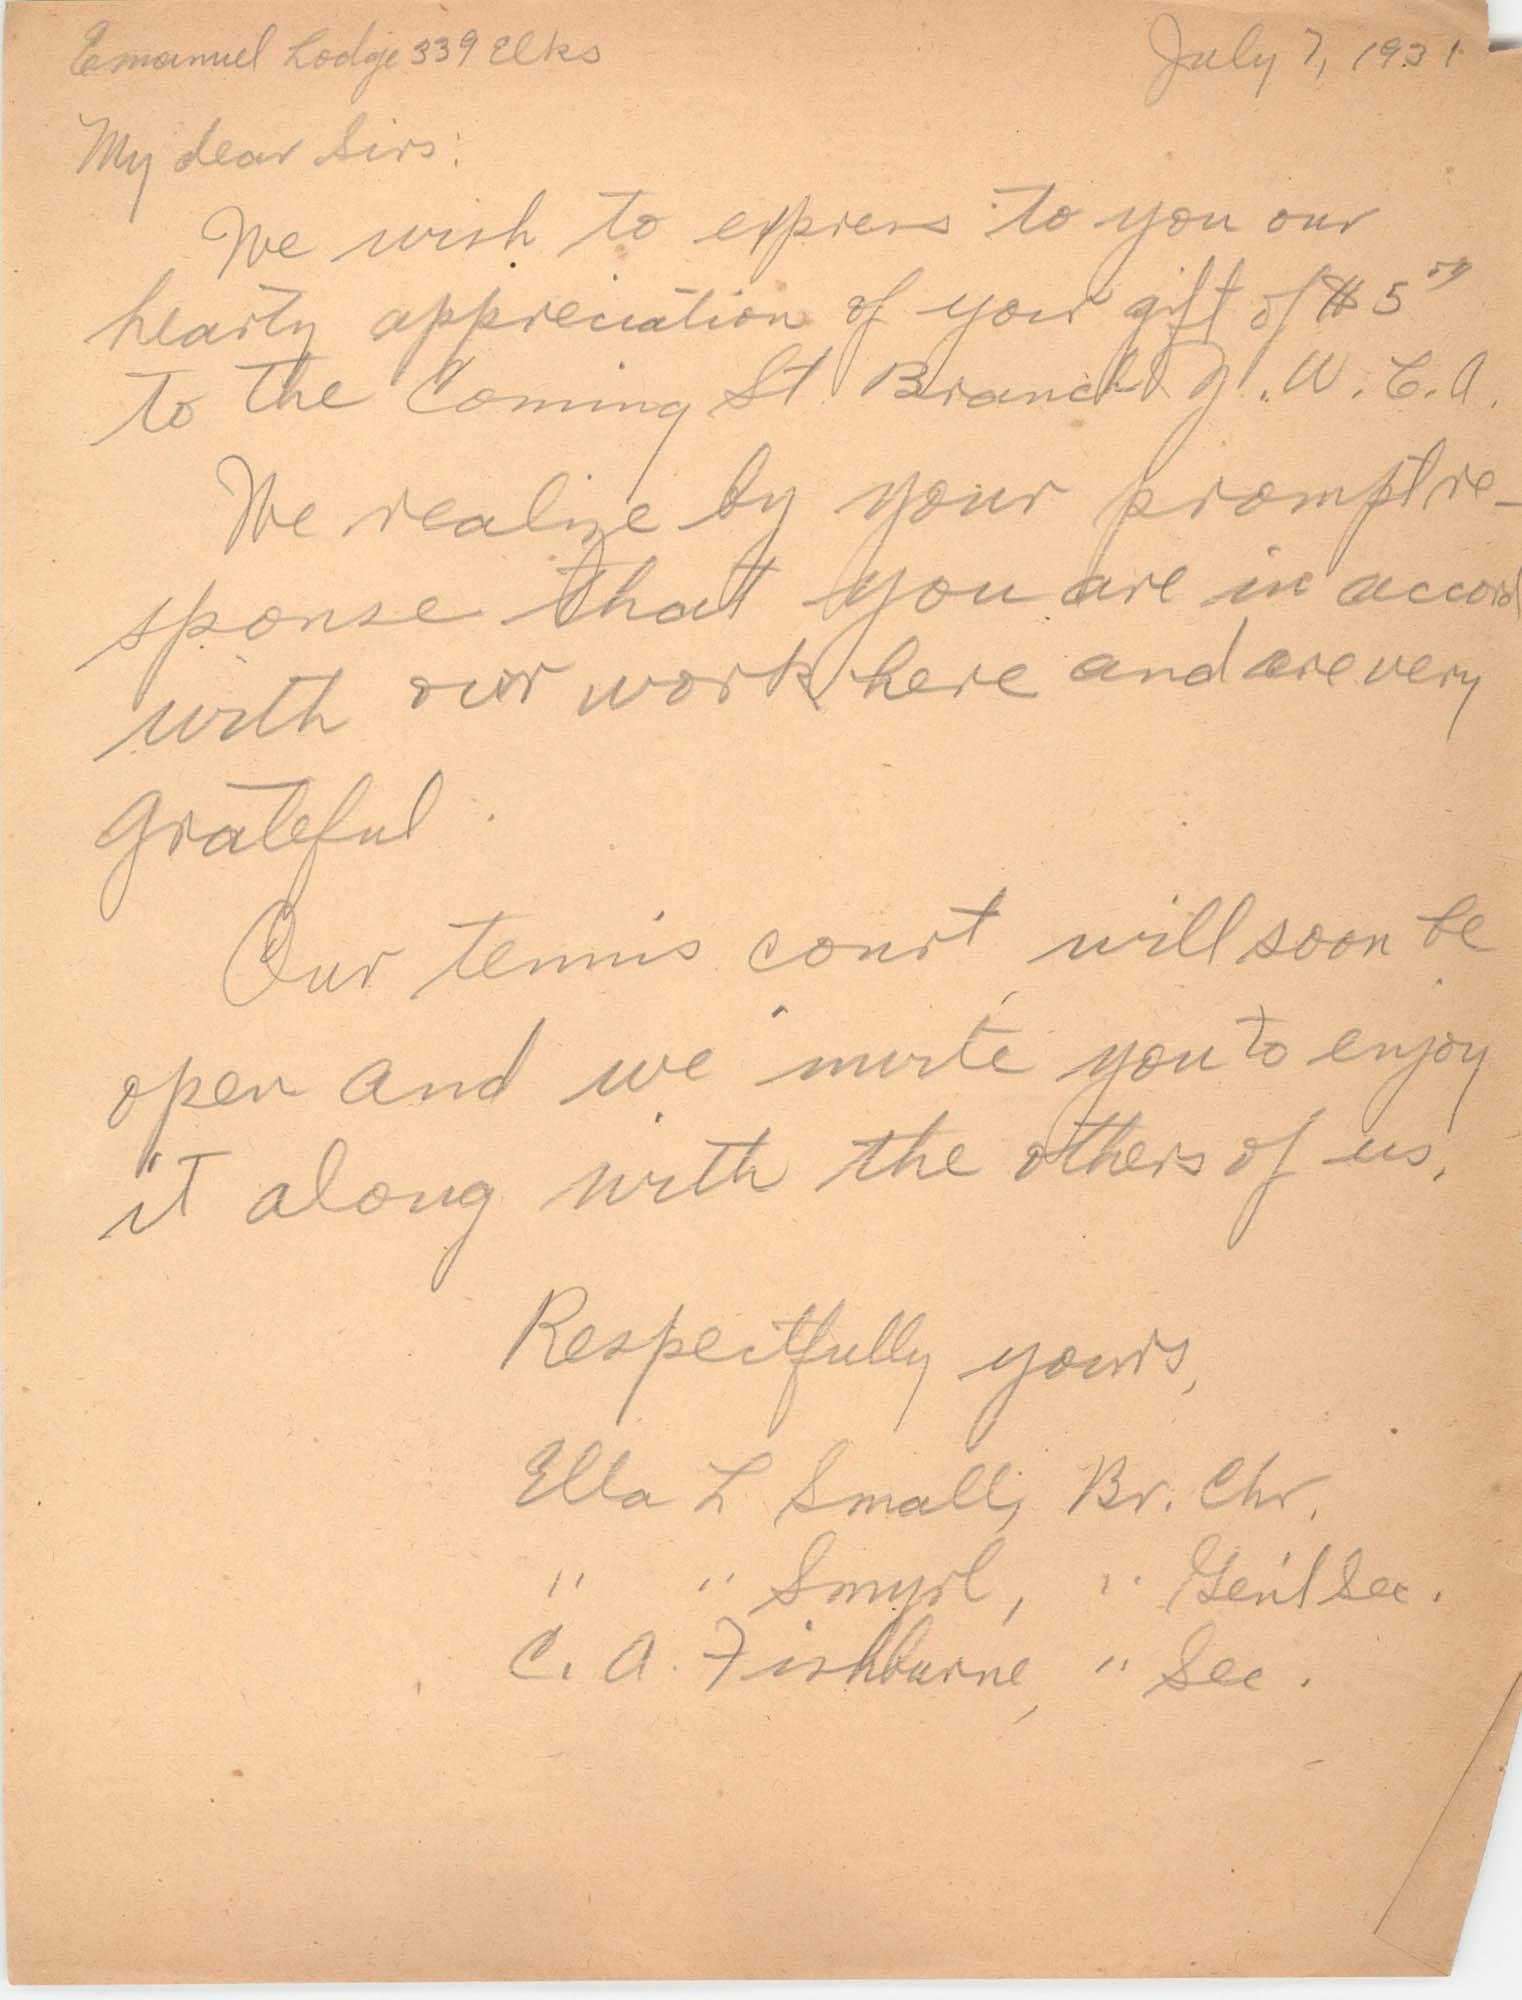 Letter from Ella L. Smyrl and C. A. Fishburne, July 7, 1931